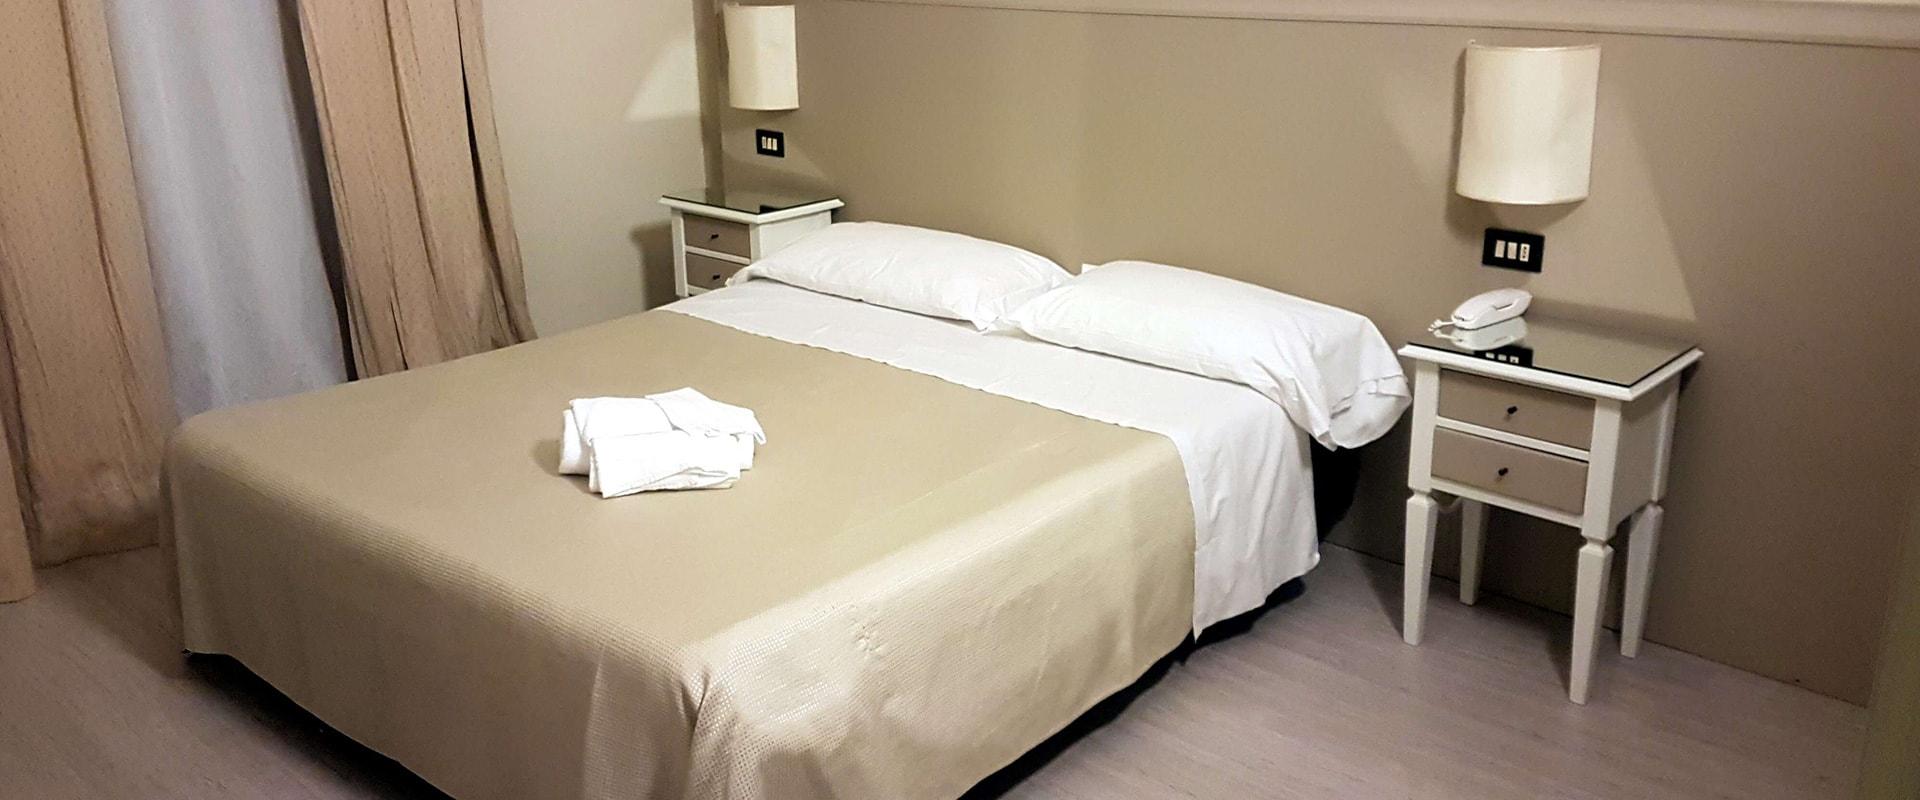 dove dormire a montecatini - Park hotel moderno